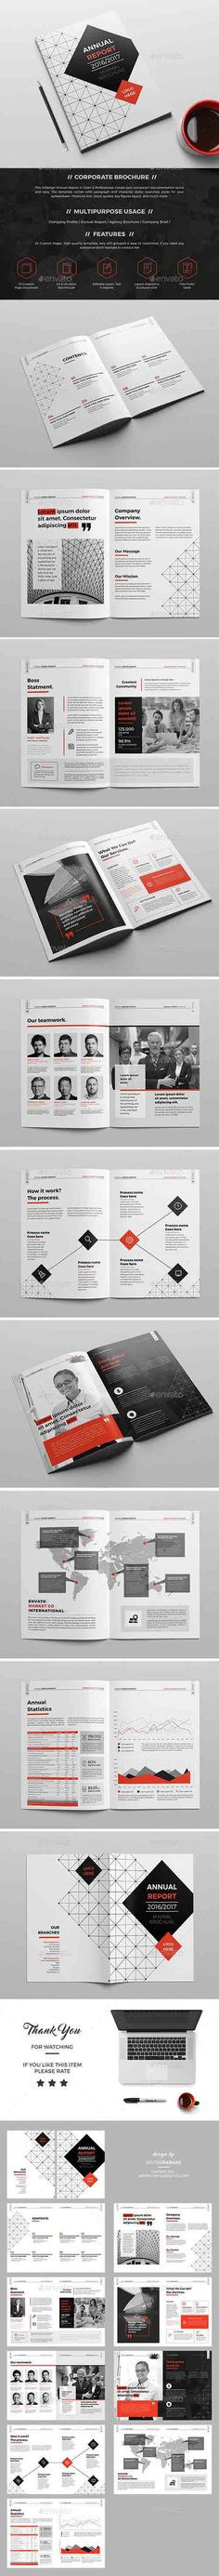 GraphicRiver - Company Brochure/Report 20 Page